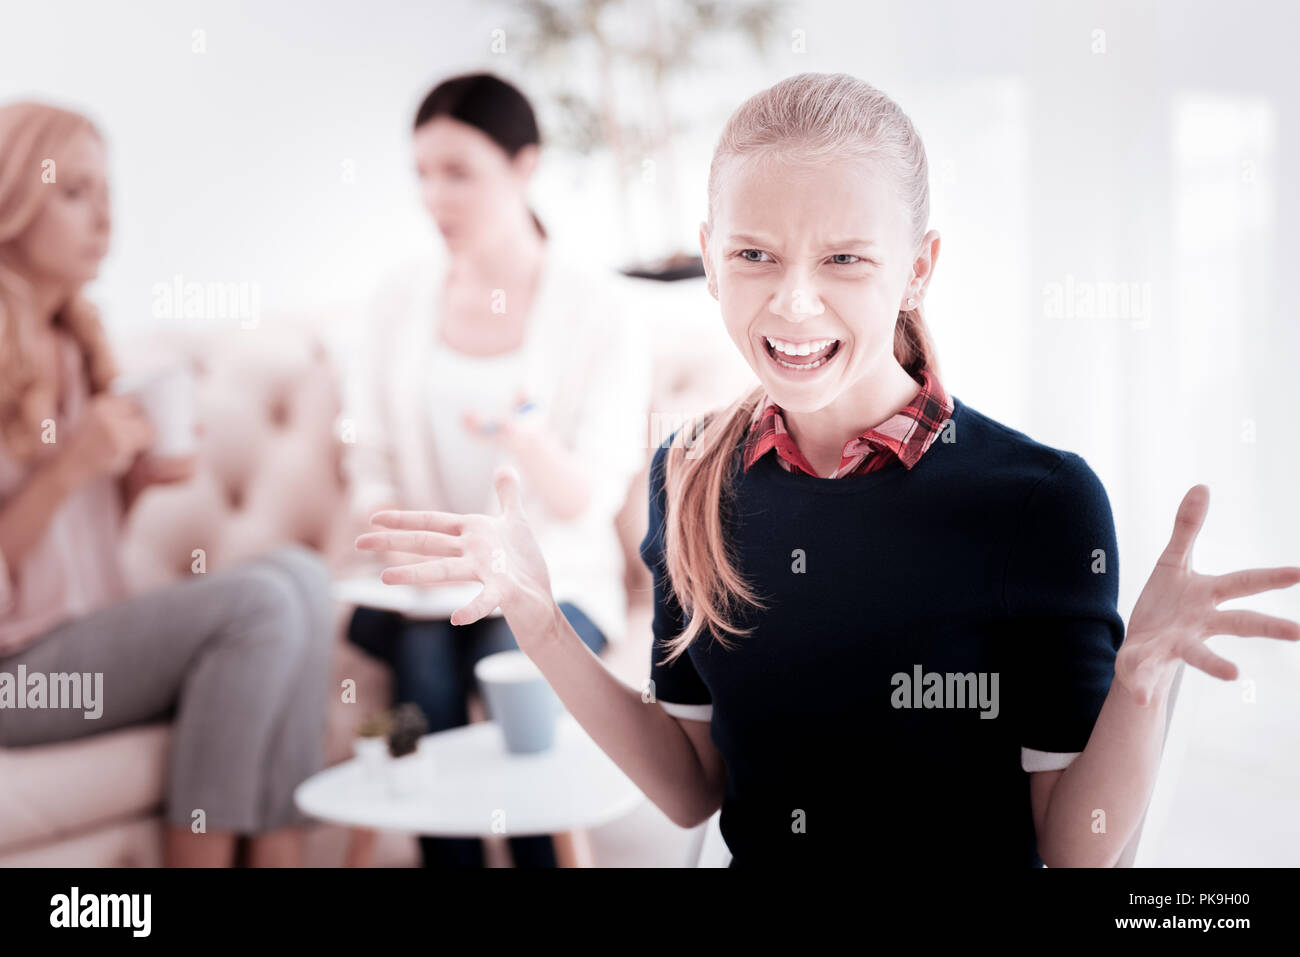 Emotional teenage girl shouting and feeling angry - Stock Image